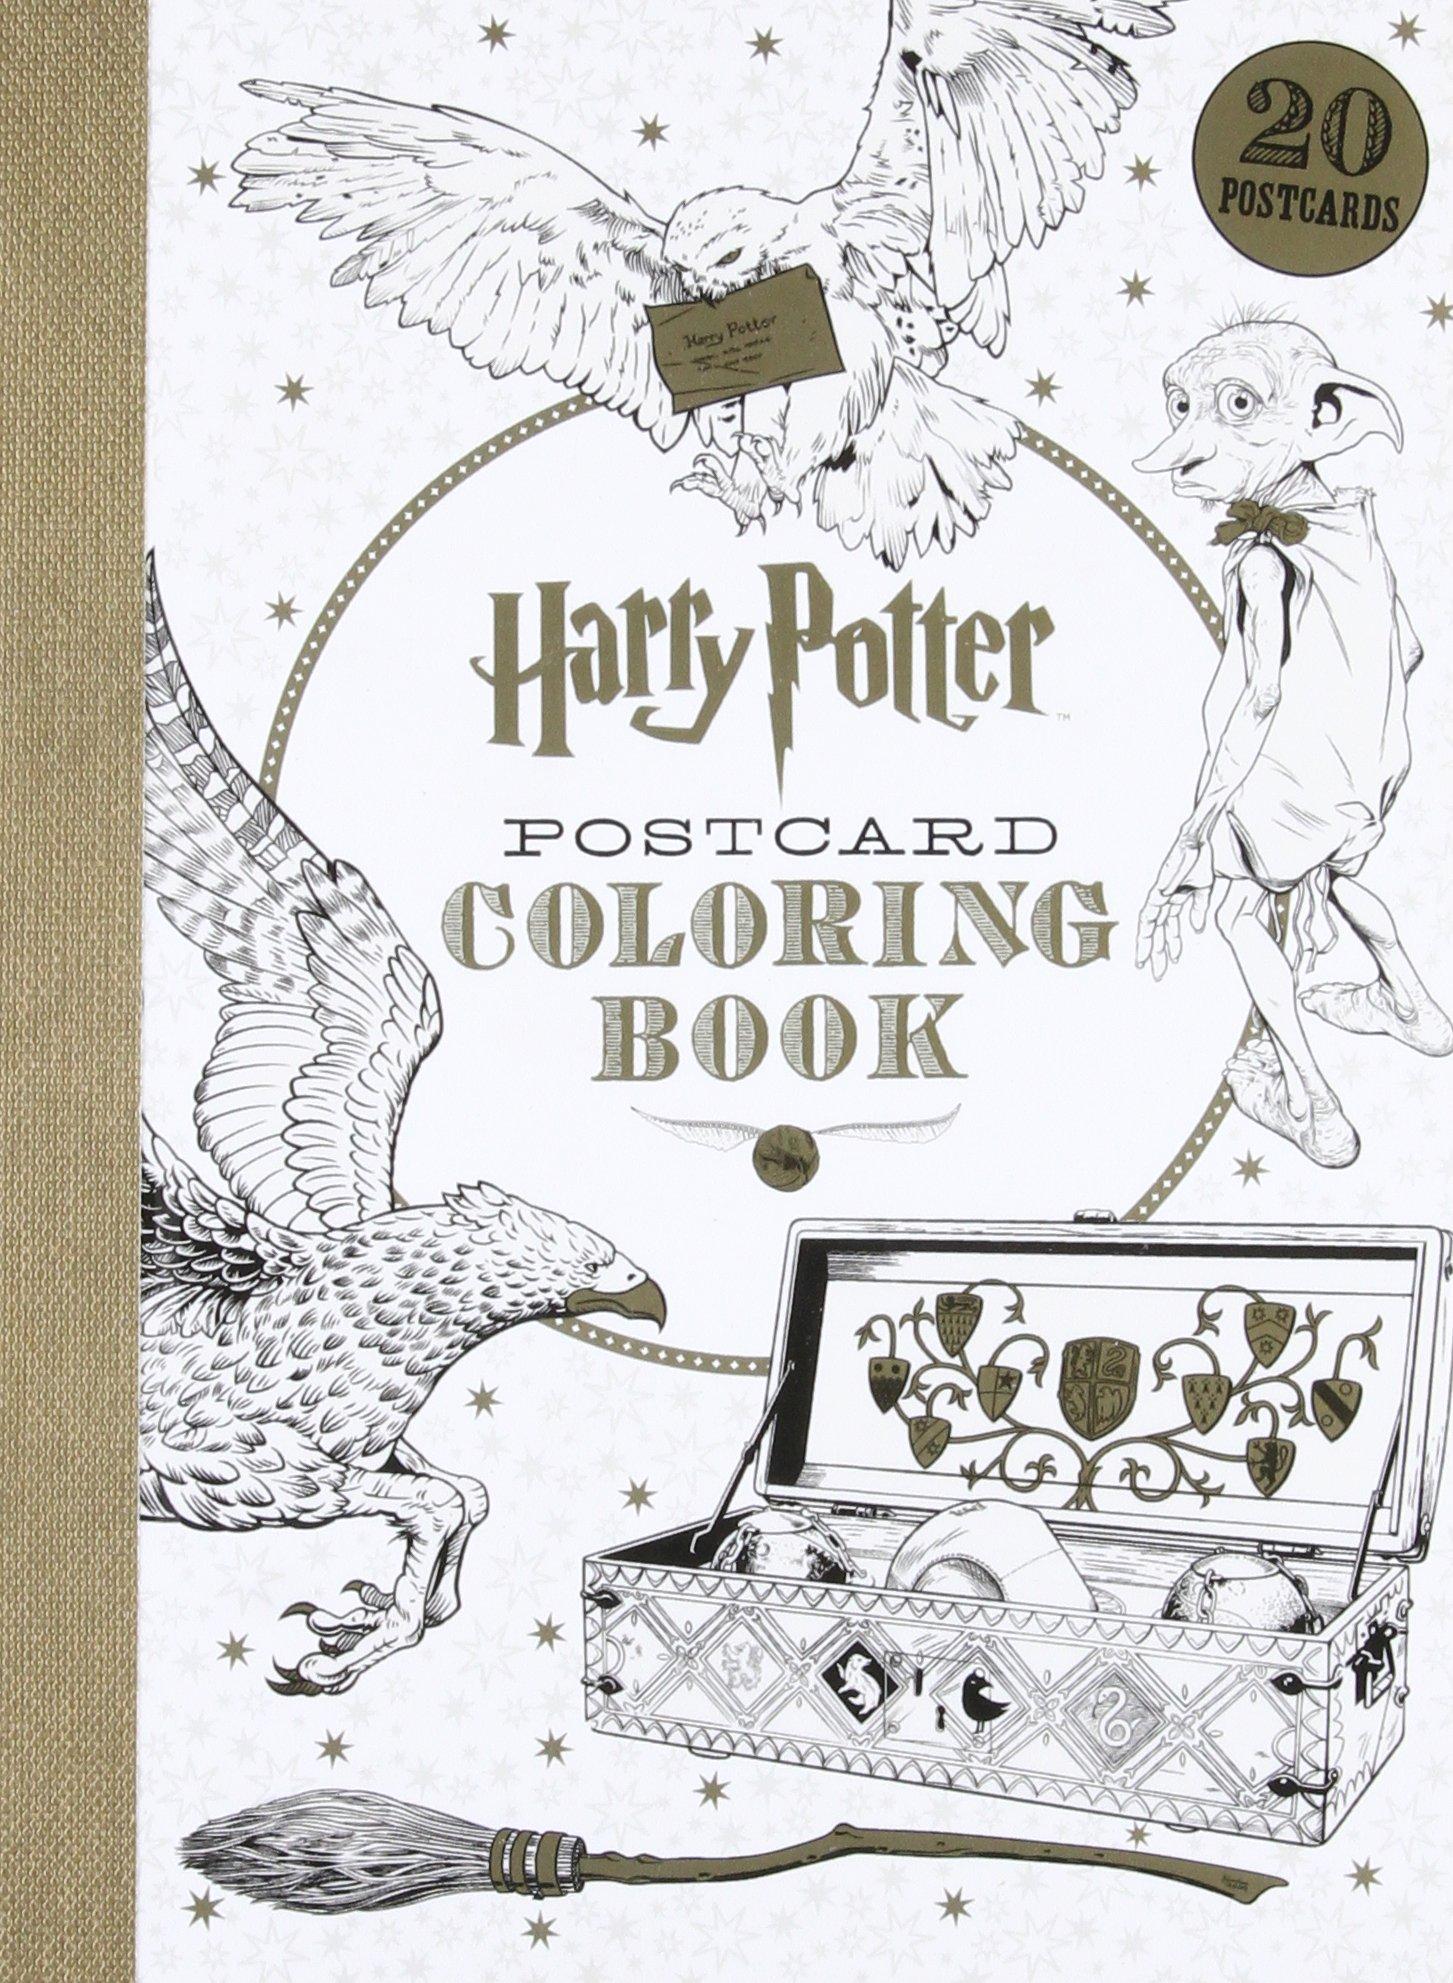 Harry Potter Postcard Coloring Book Scholastic 9781338045758 Amazon Books